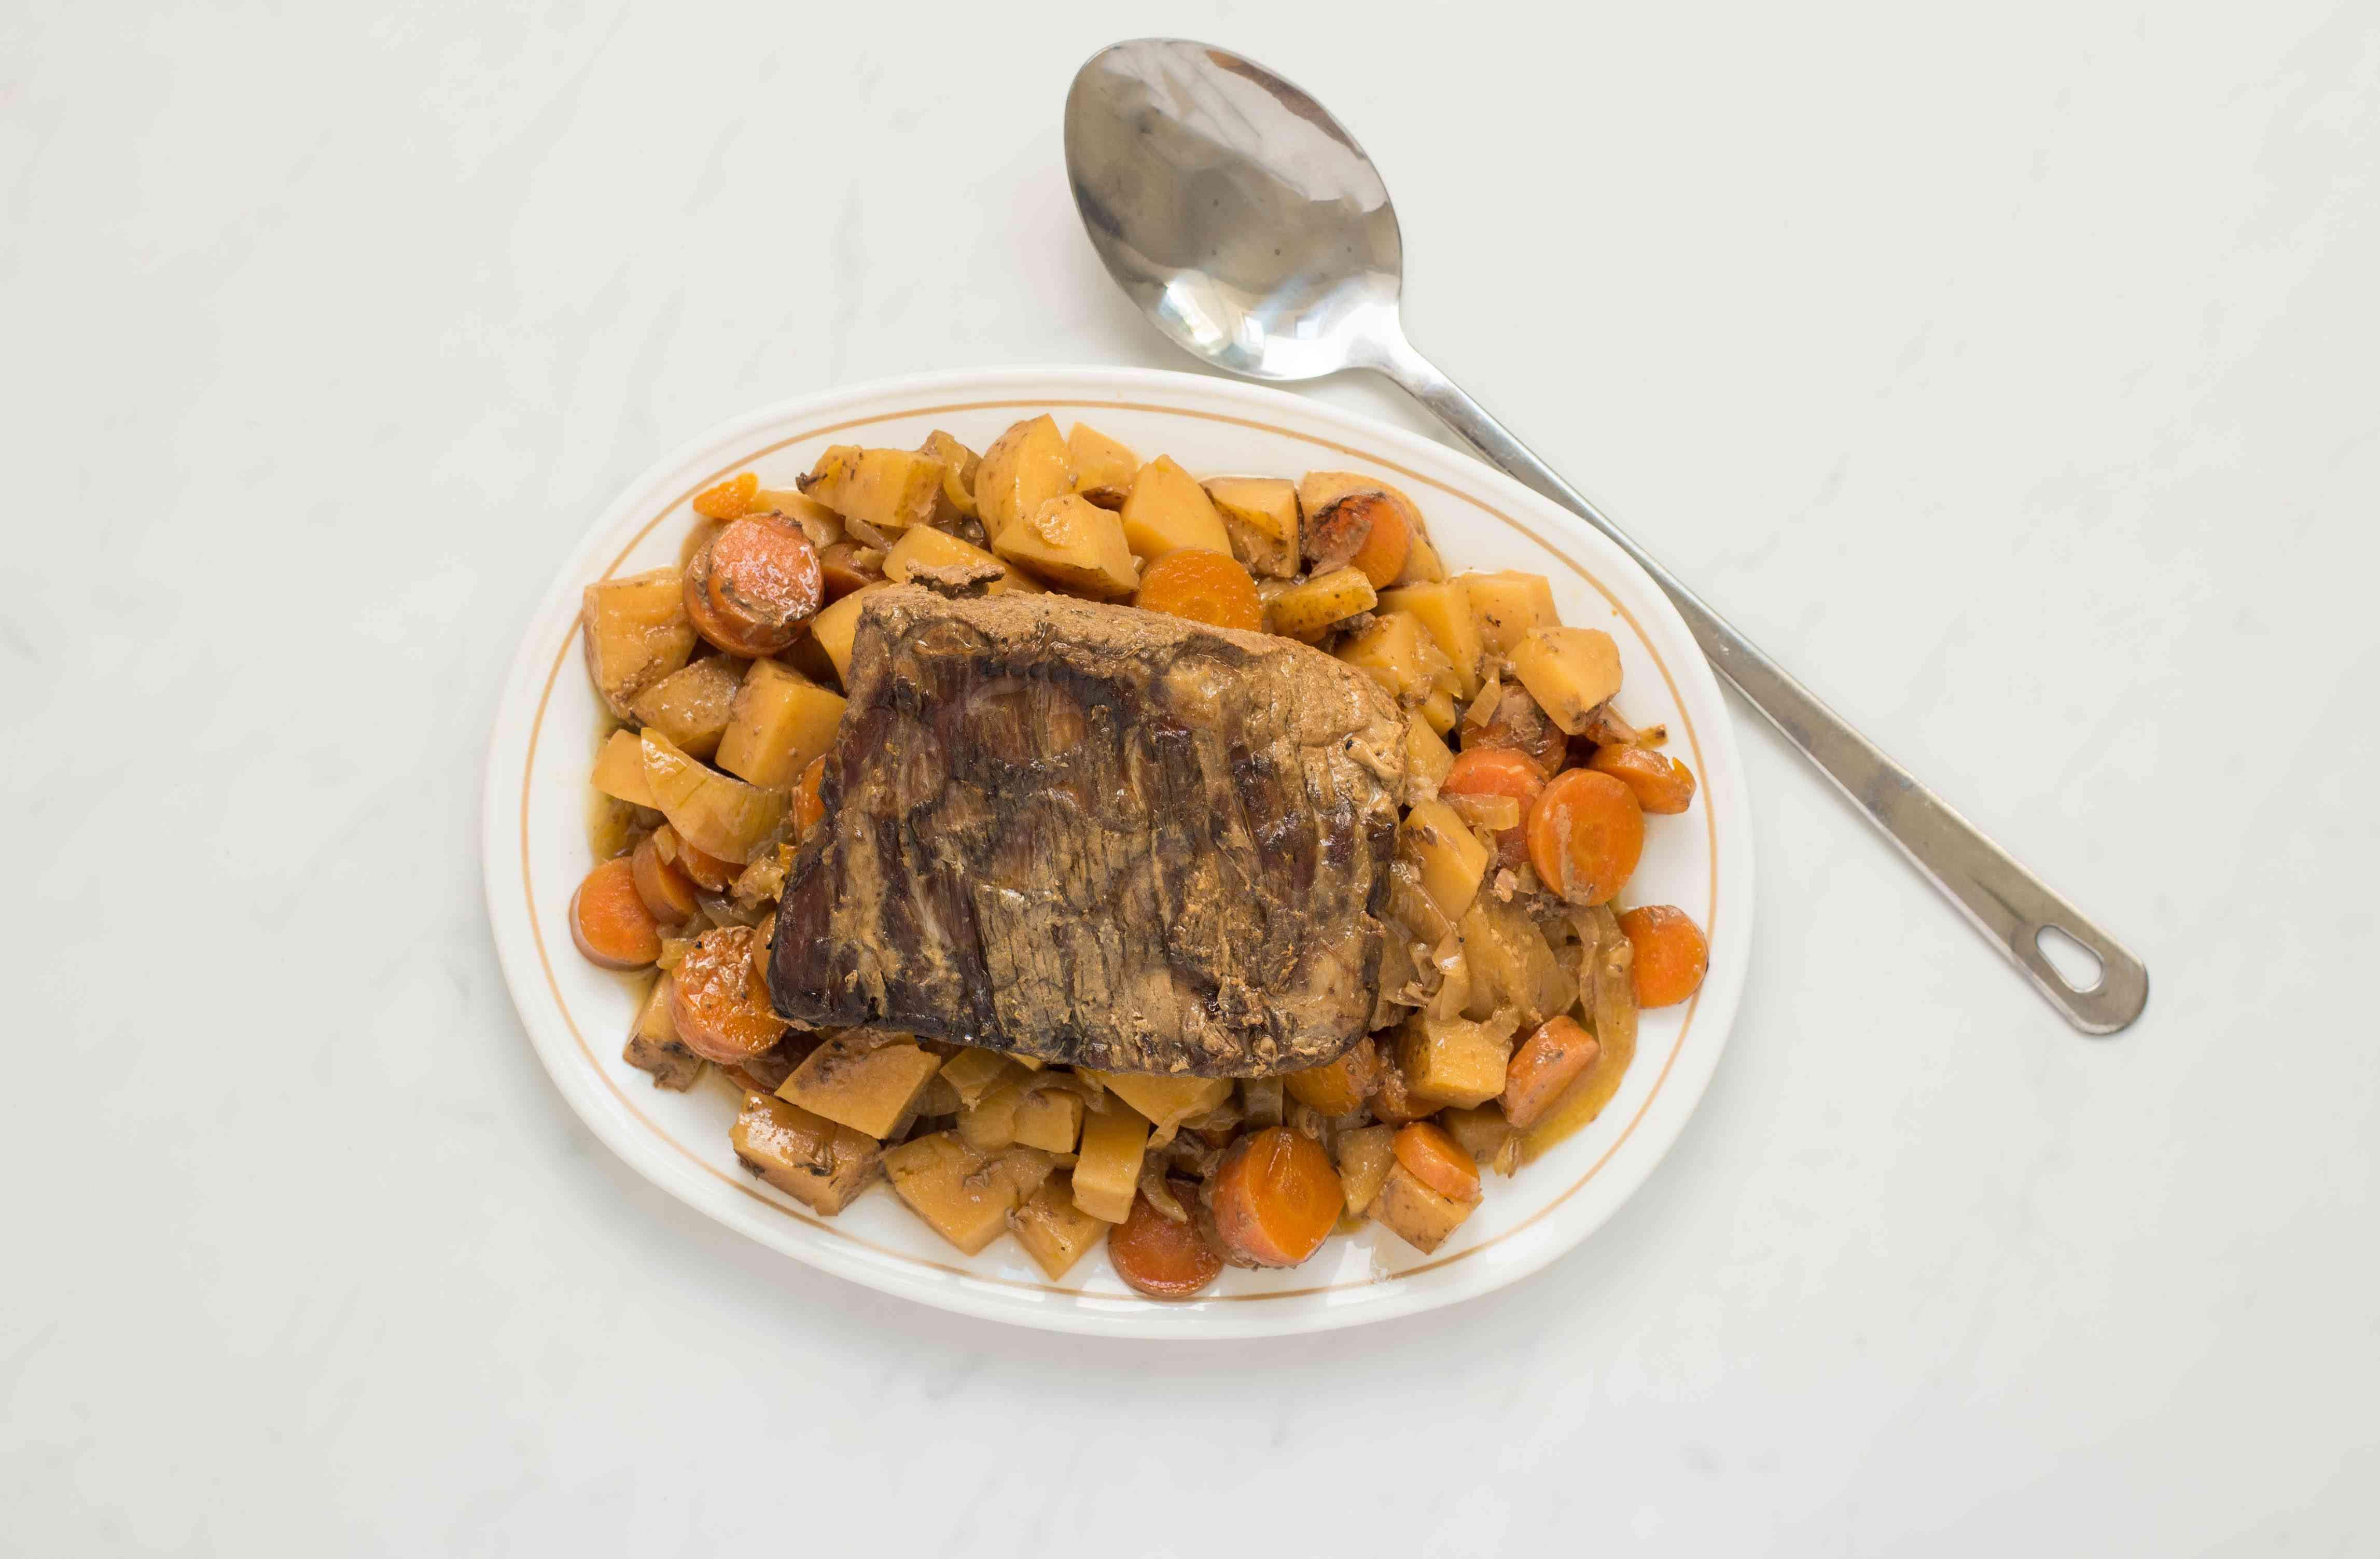 Remove roast from crock pot